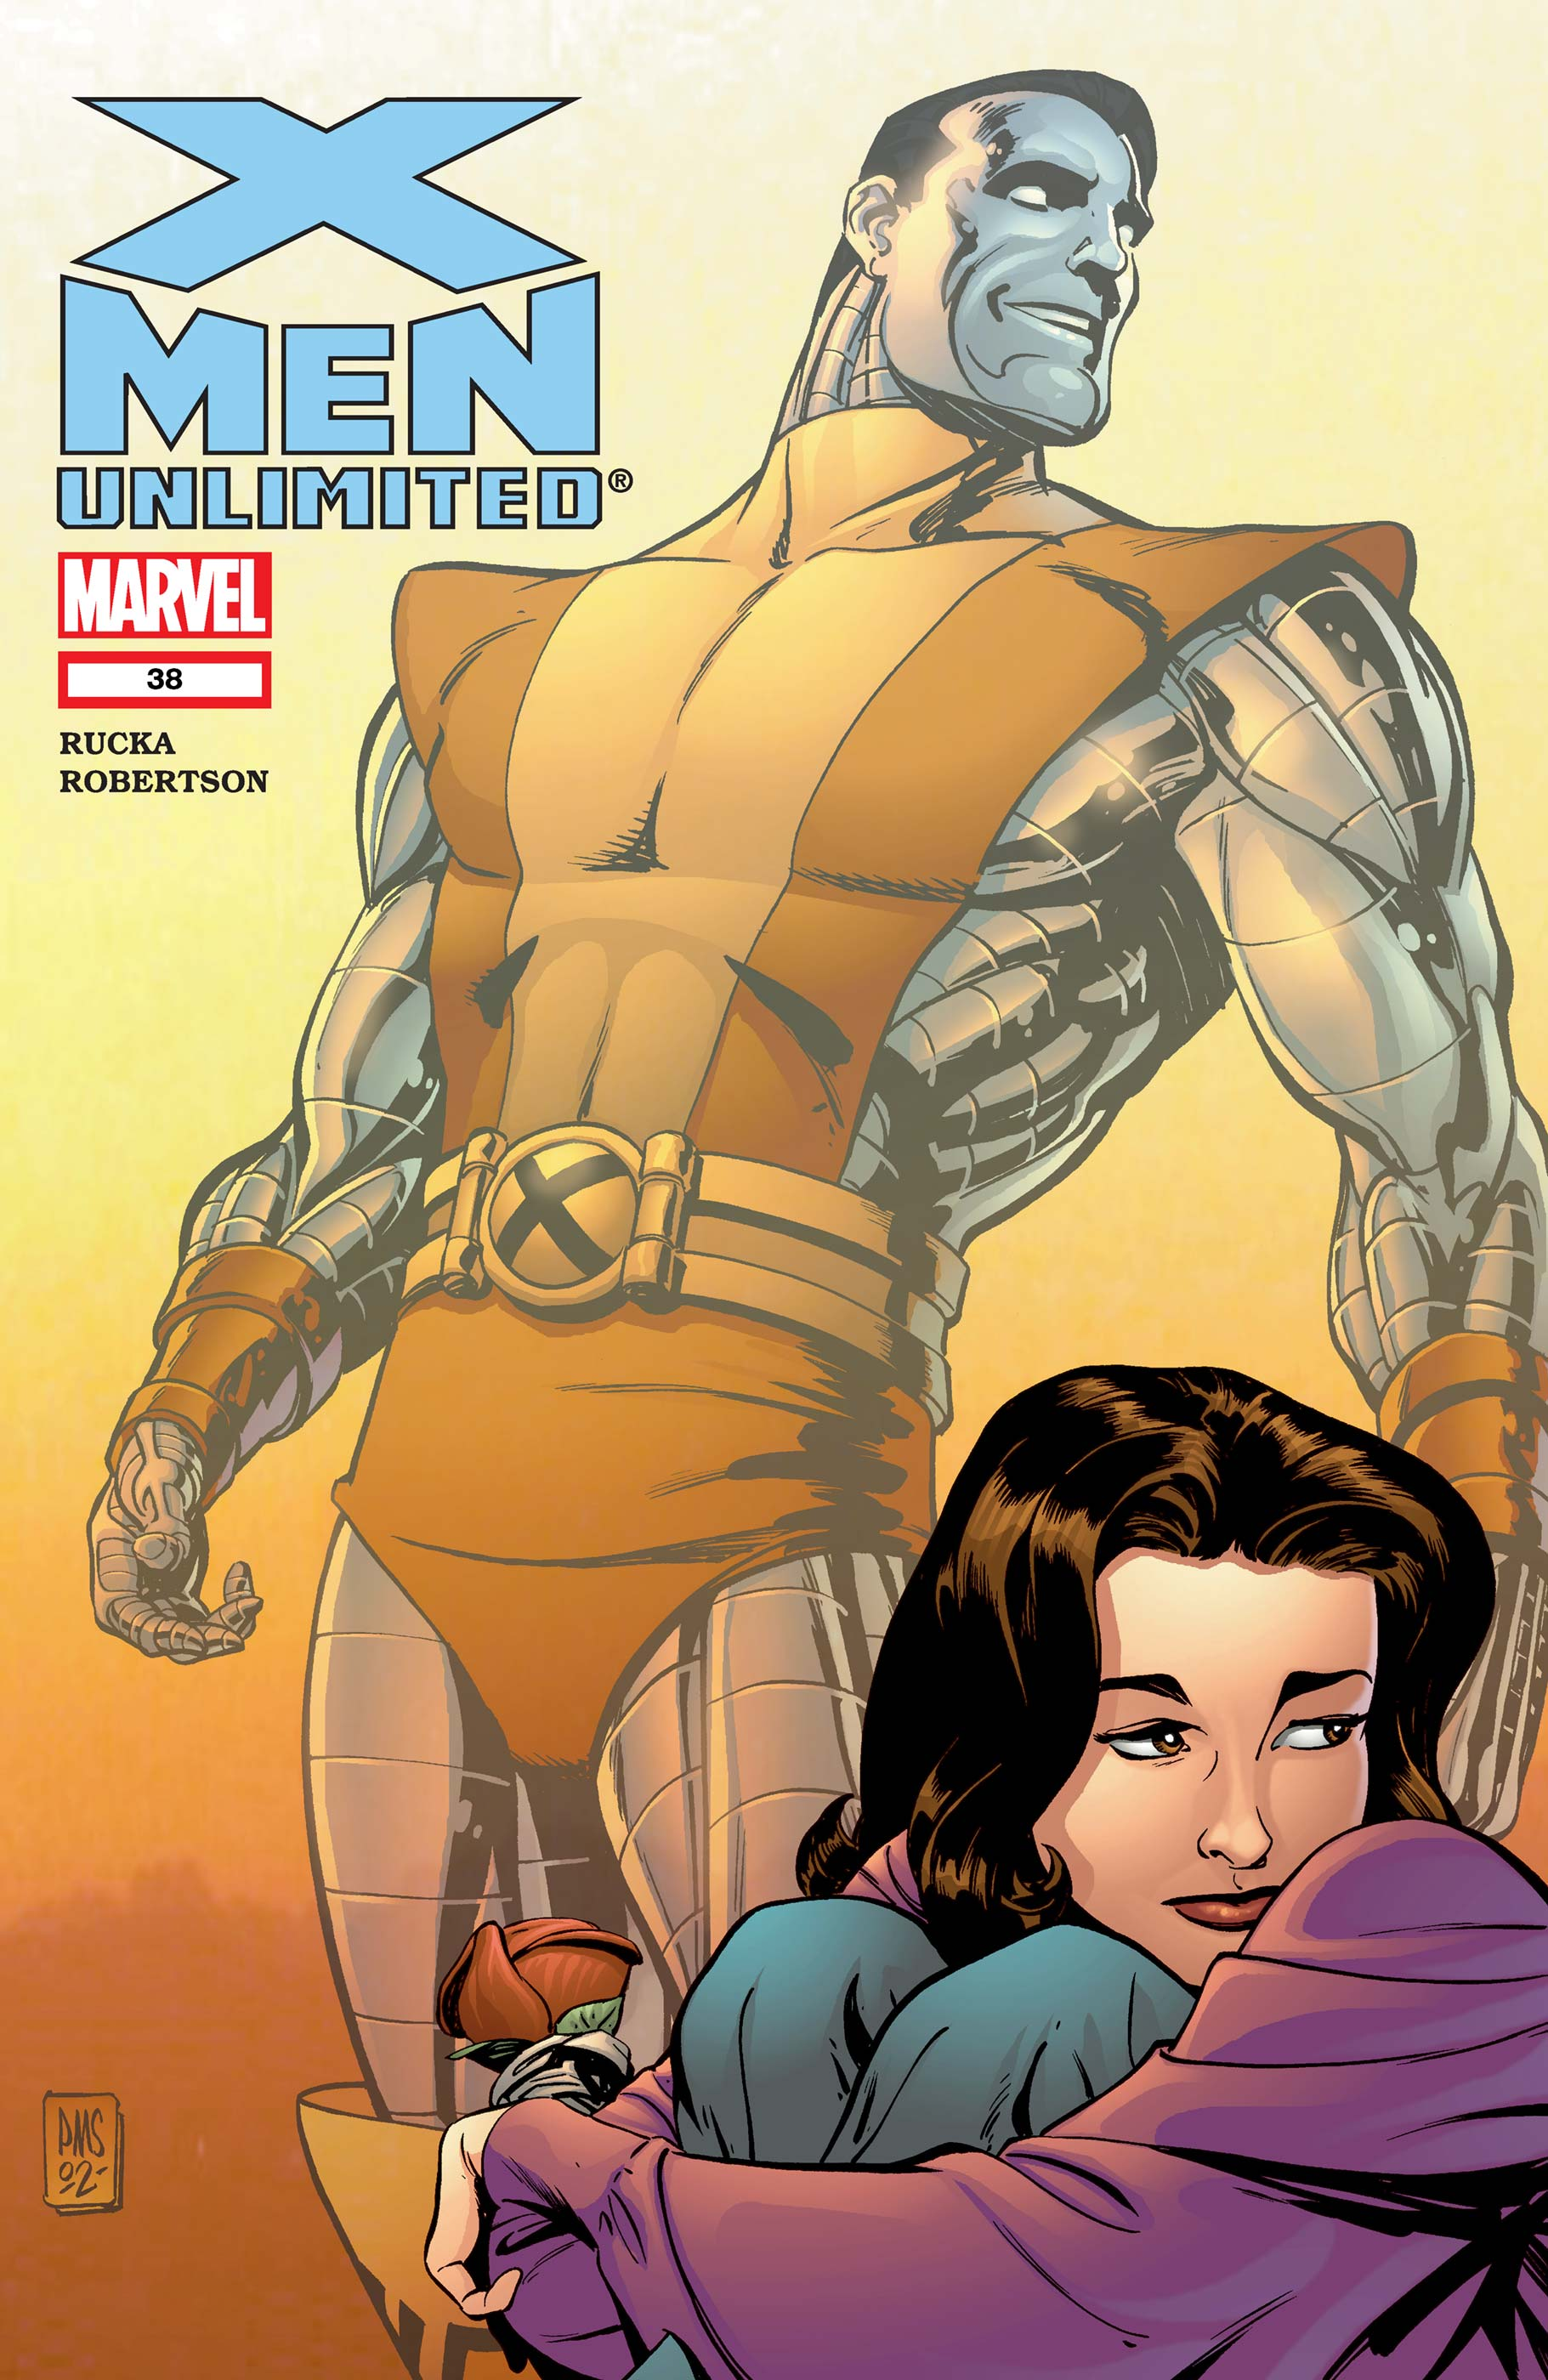 X-Men Unlimited (1993) #38